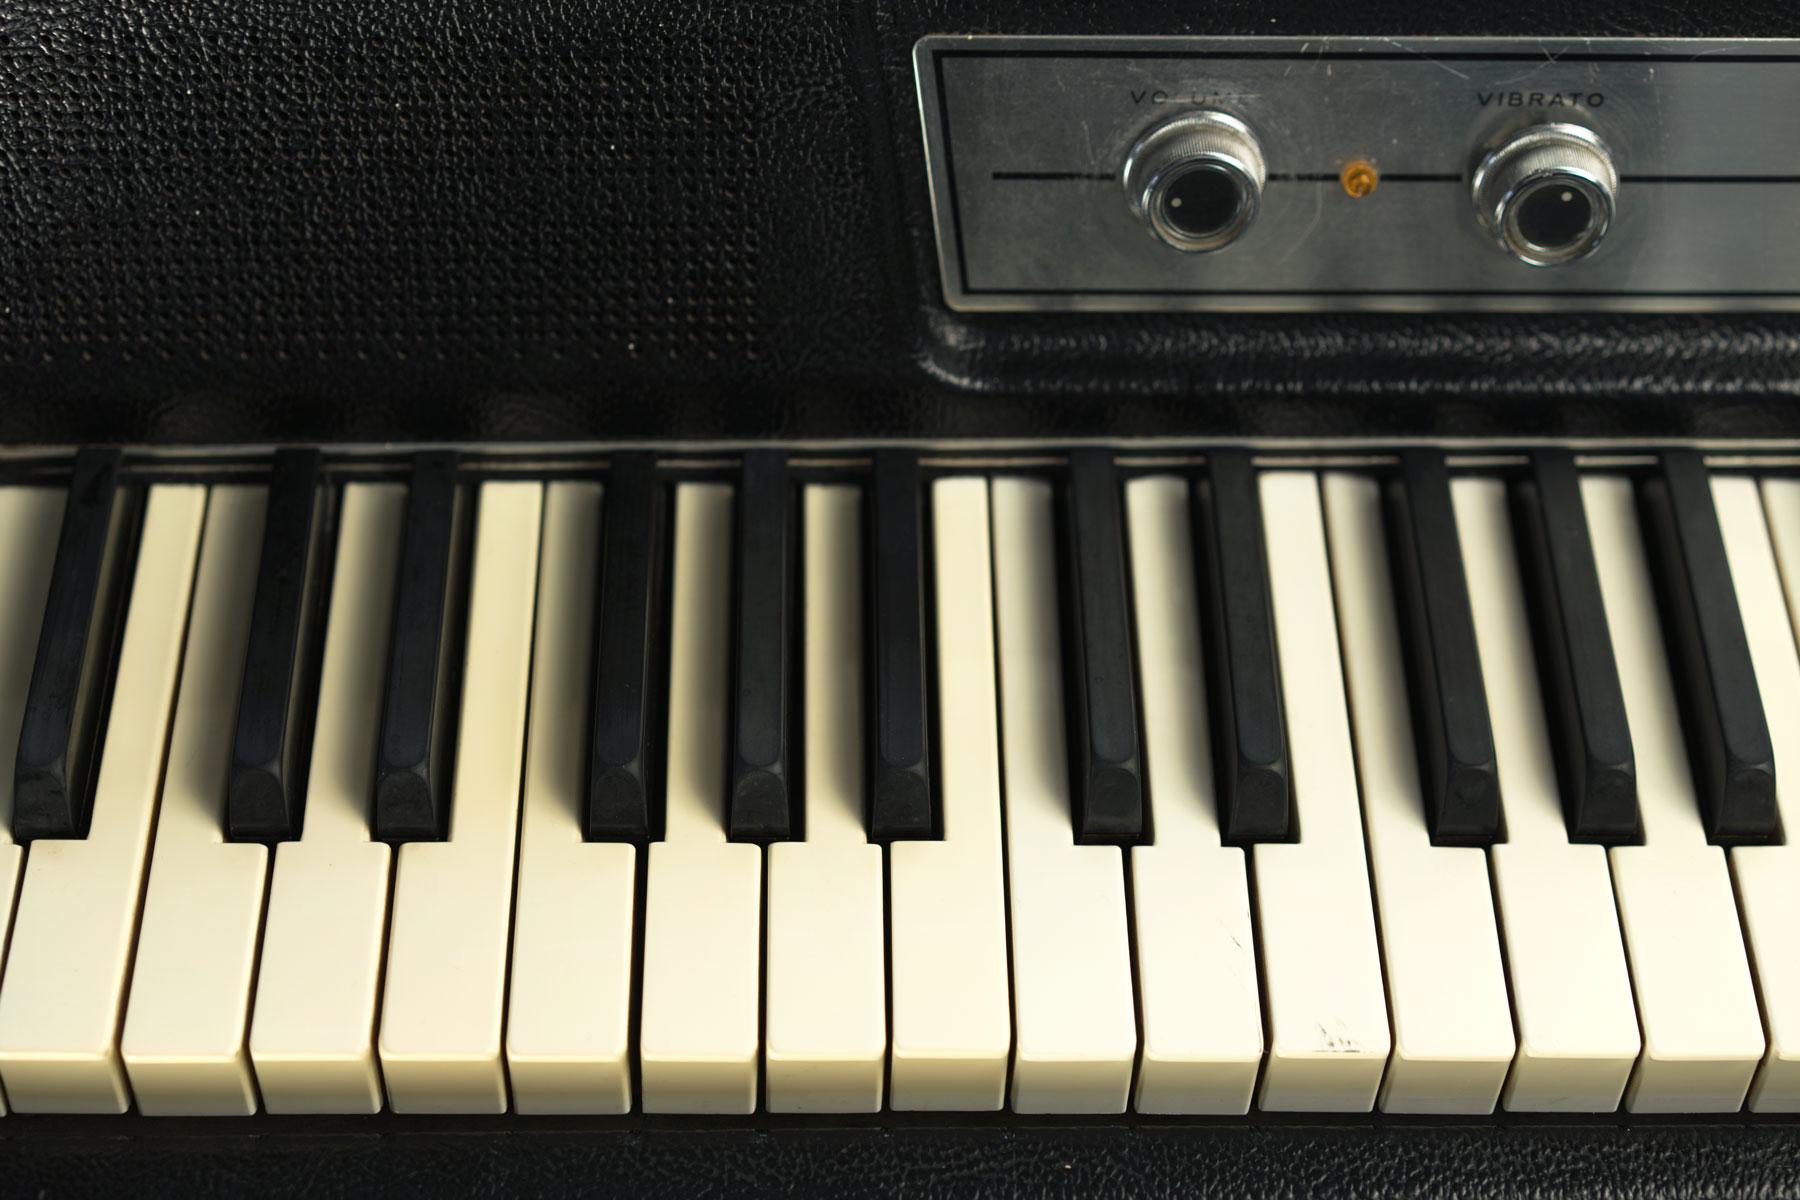 Wurlitzer-200-electronic-piano-keys.jpg